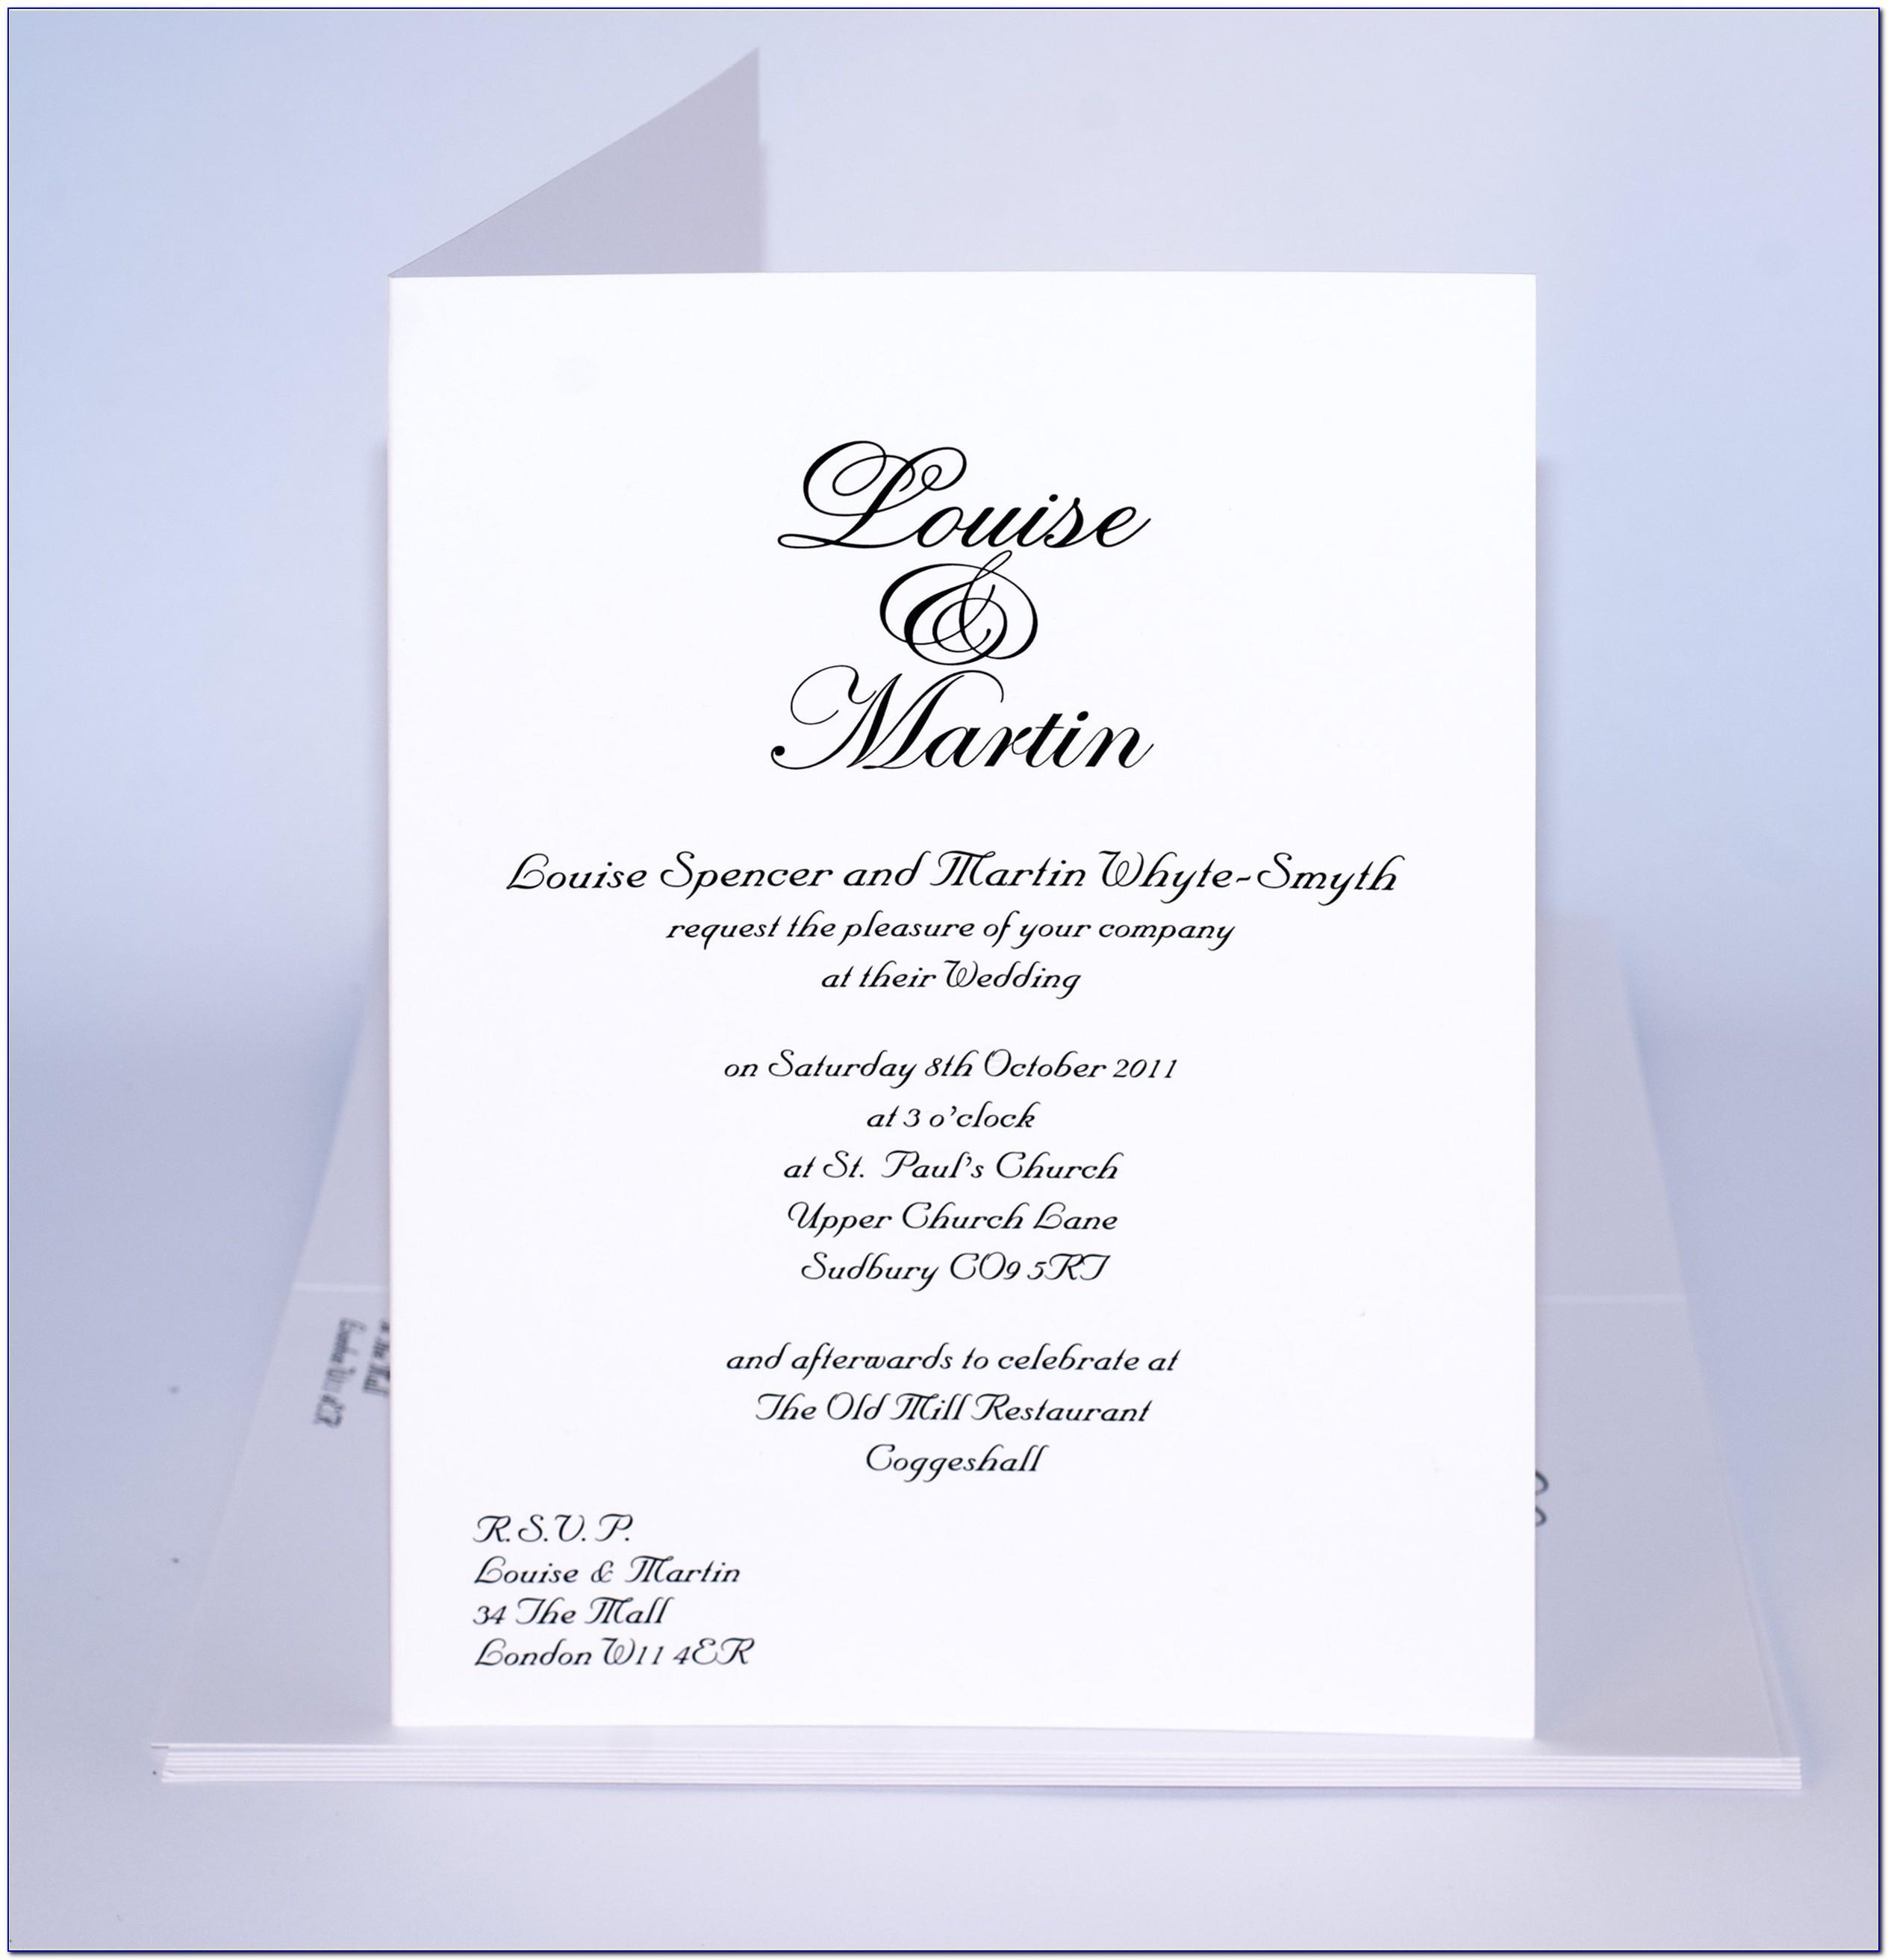 Sample Wedding Invitation Designs Philippines